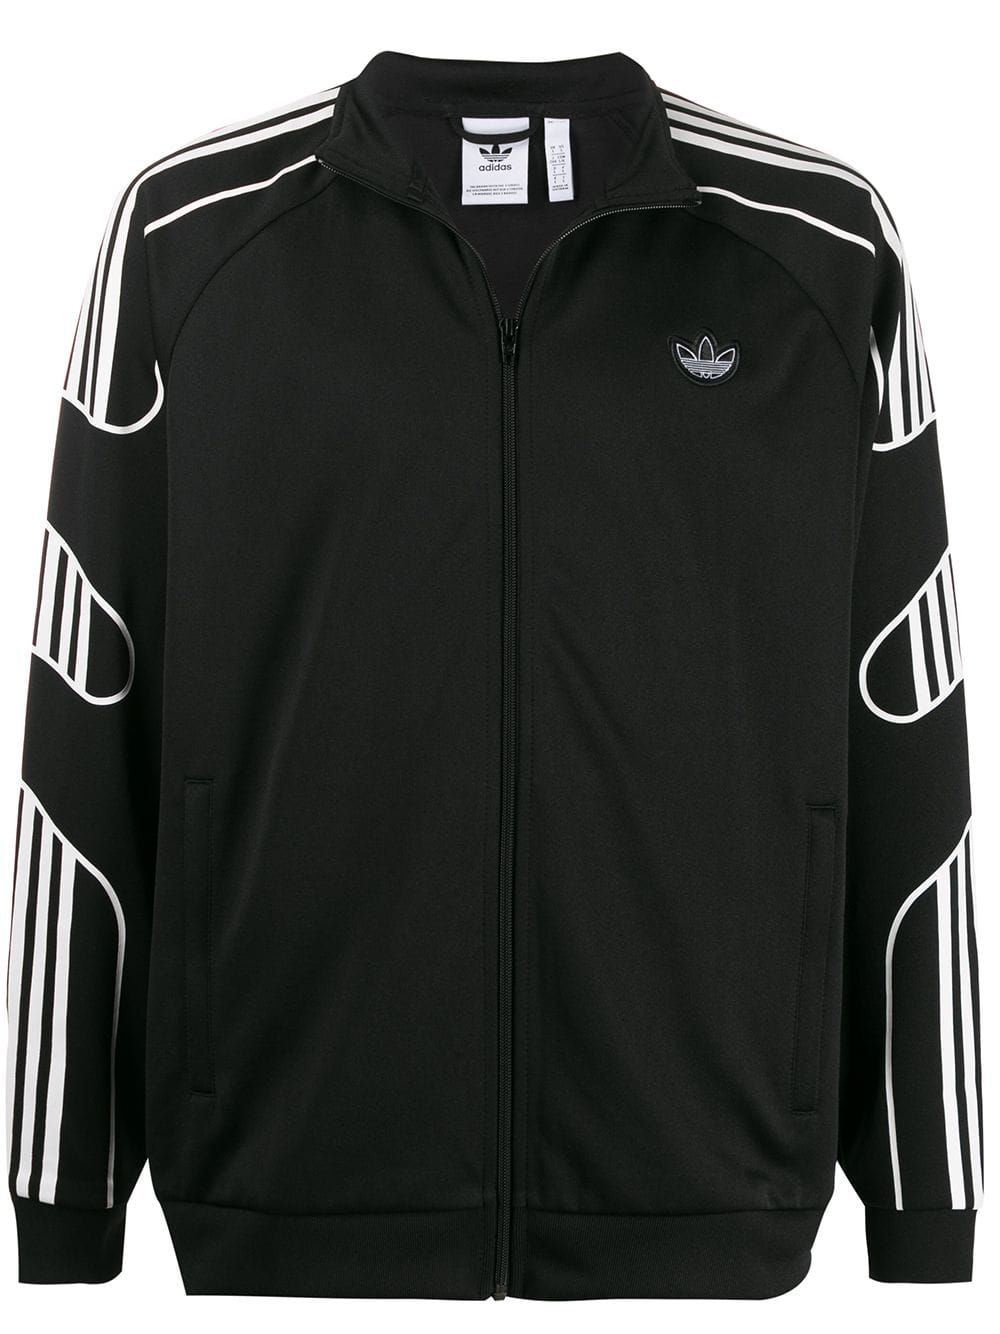 Adidas Flamestrike Track Jacket in 2019 | Jackets, Adidas